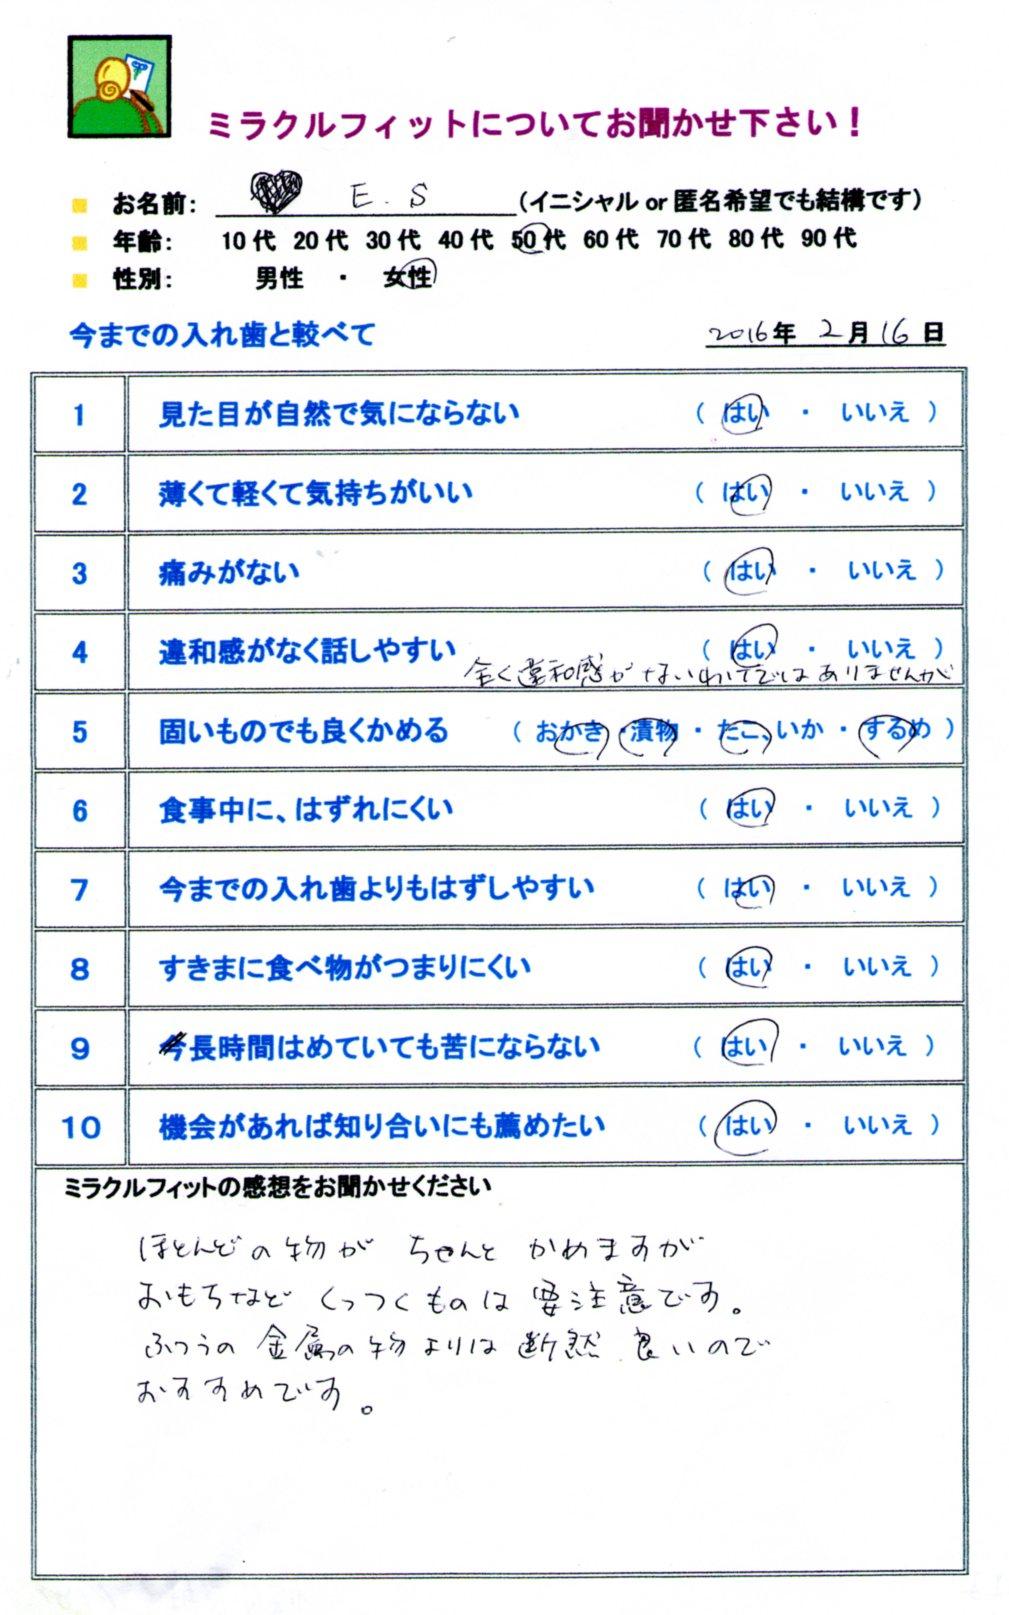 http://www.hayashi-dental.info/voice69.jpg